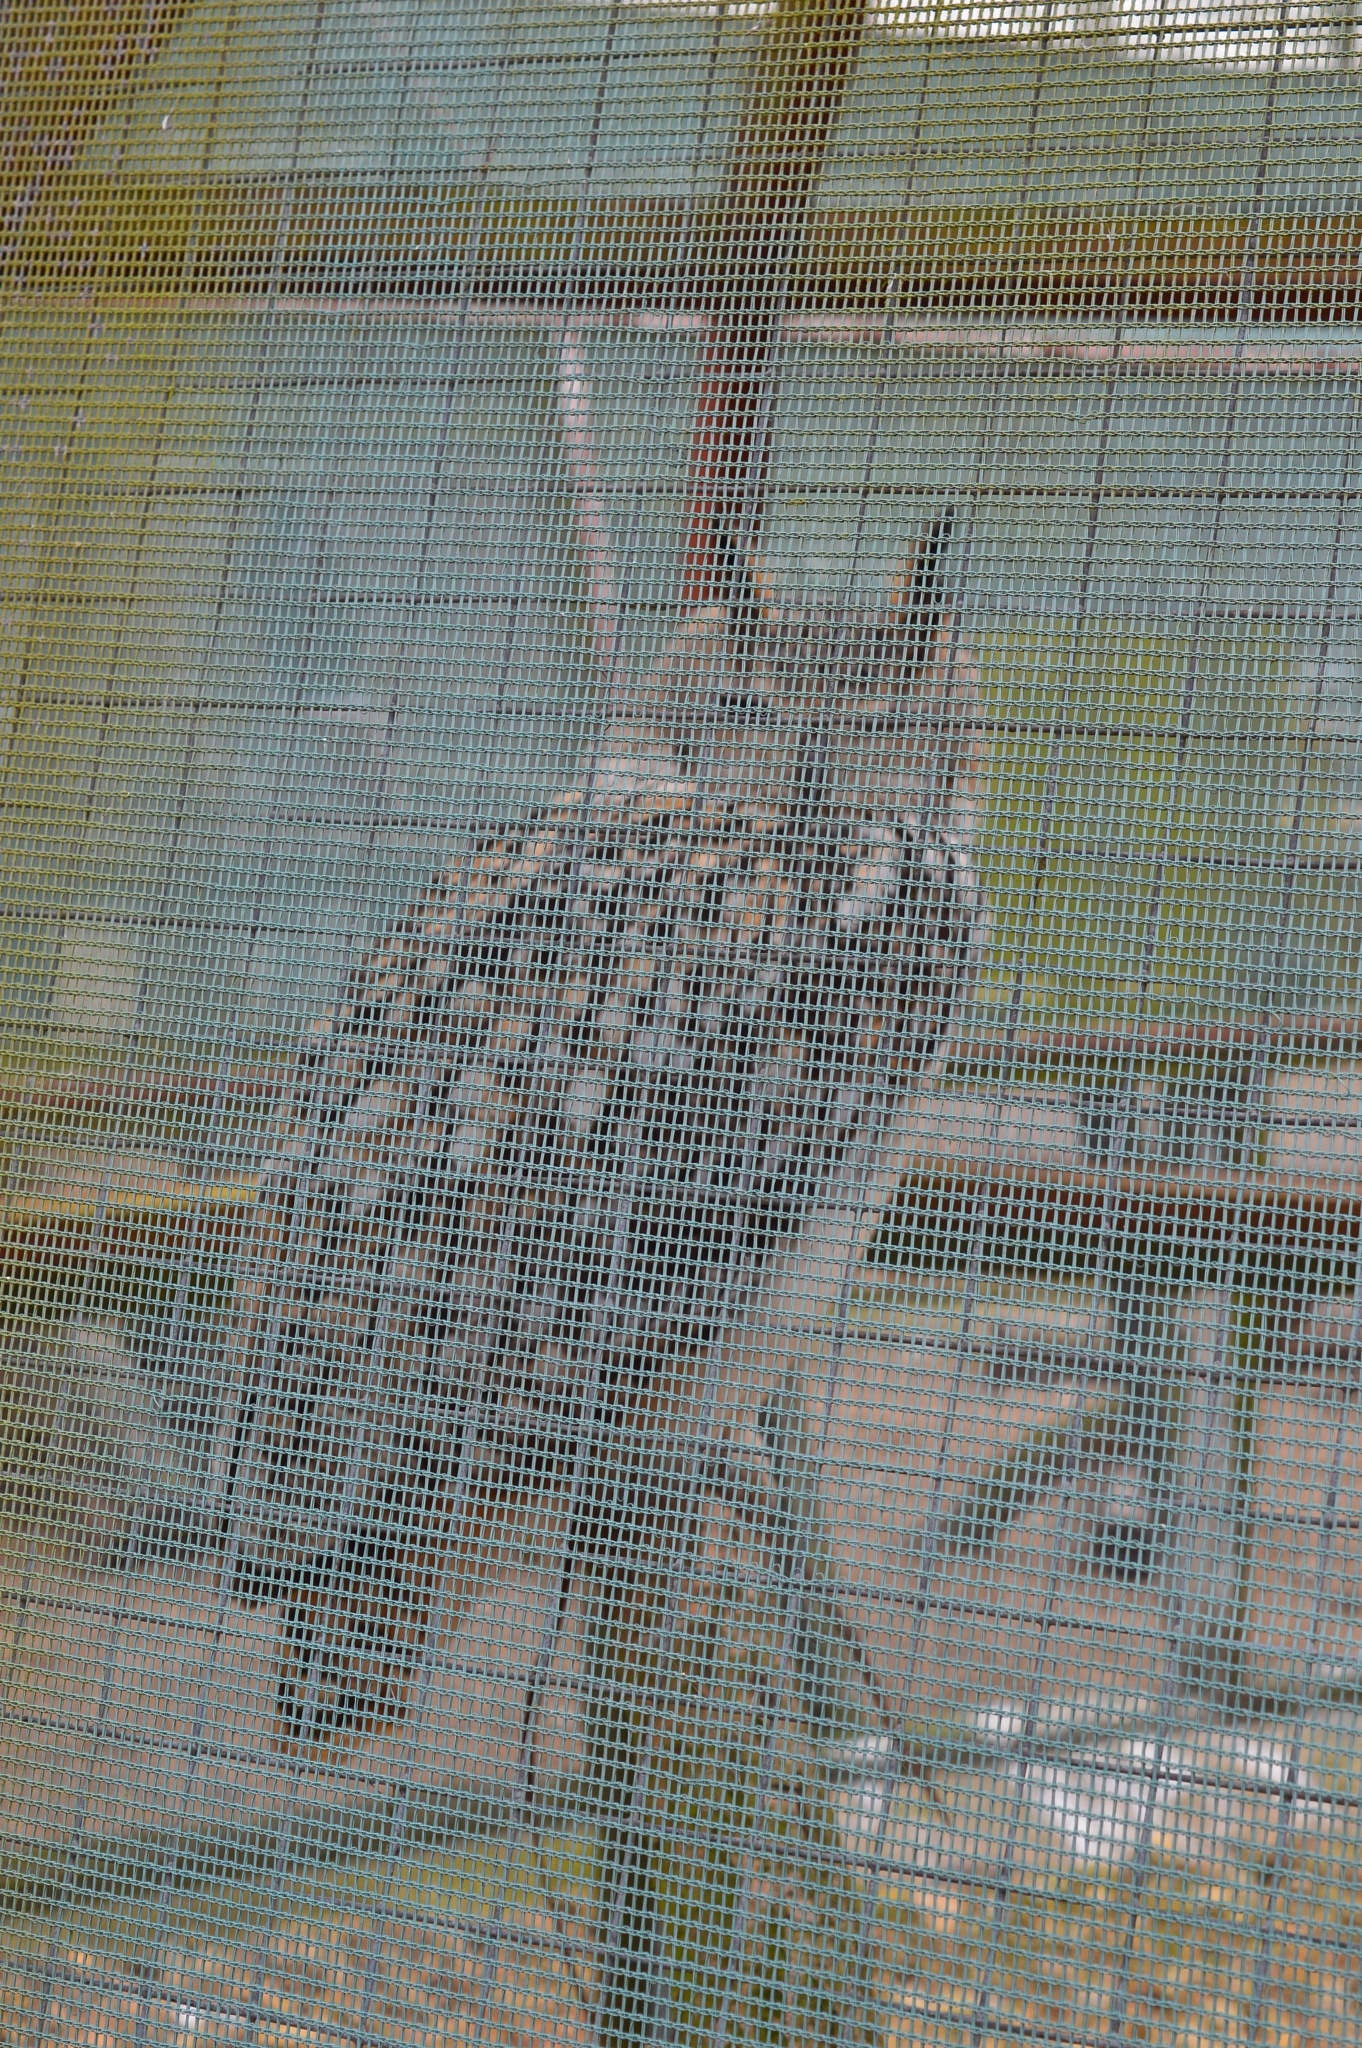 Bengal Eagle Owl by Paul Richardson